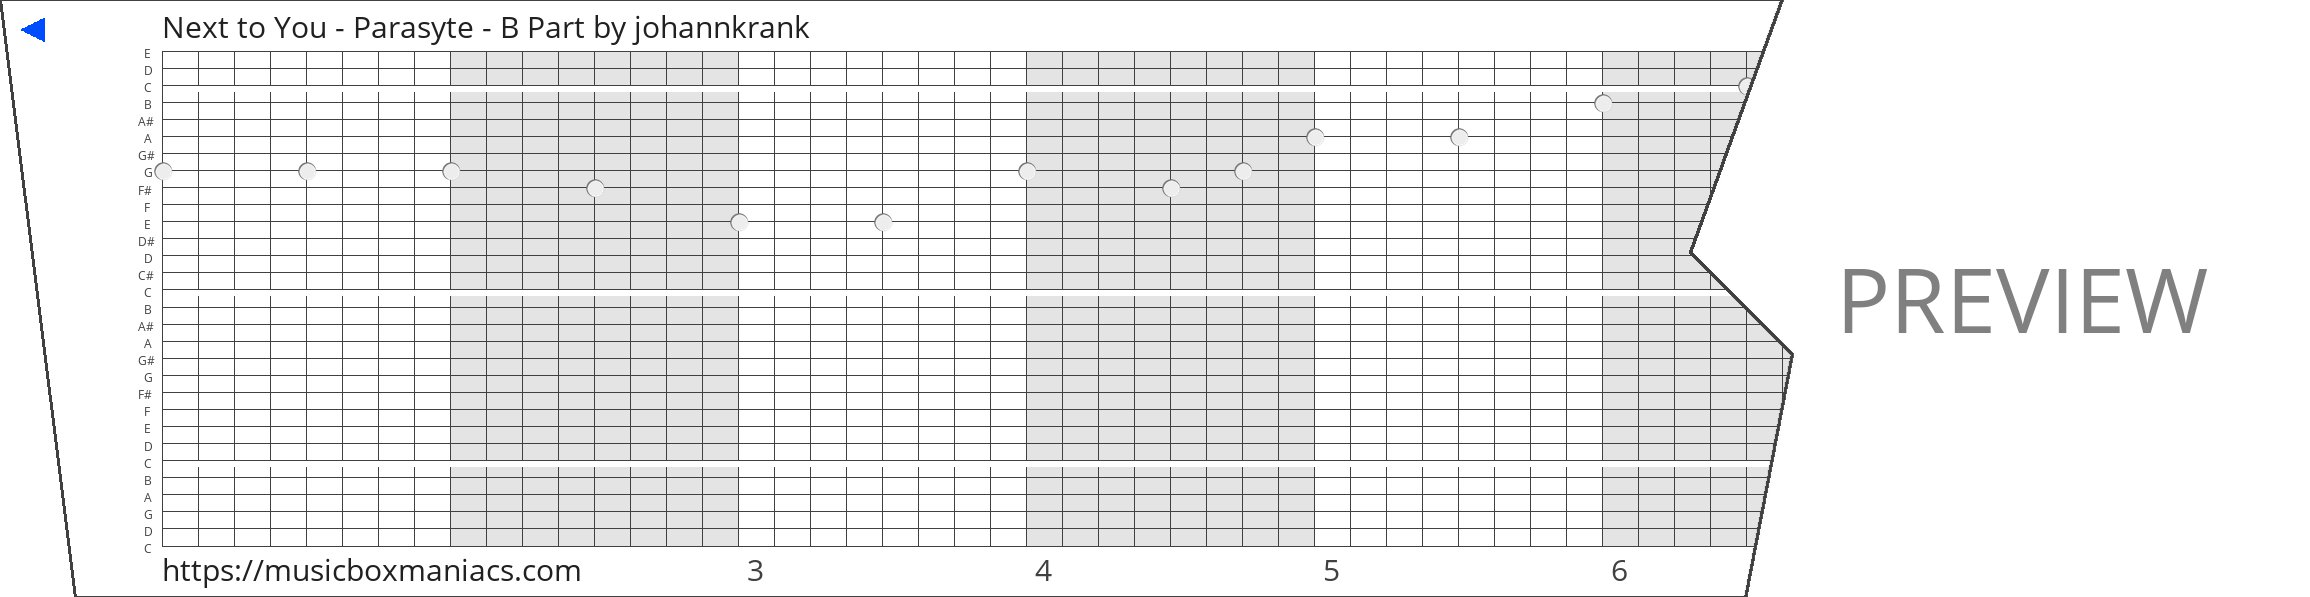 Next to You - Parasyte - B Part 30 note music box paper strip